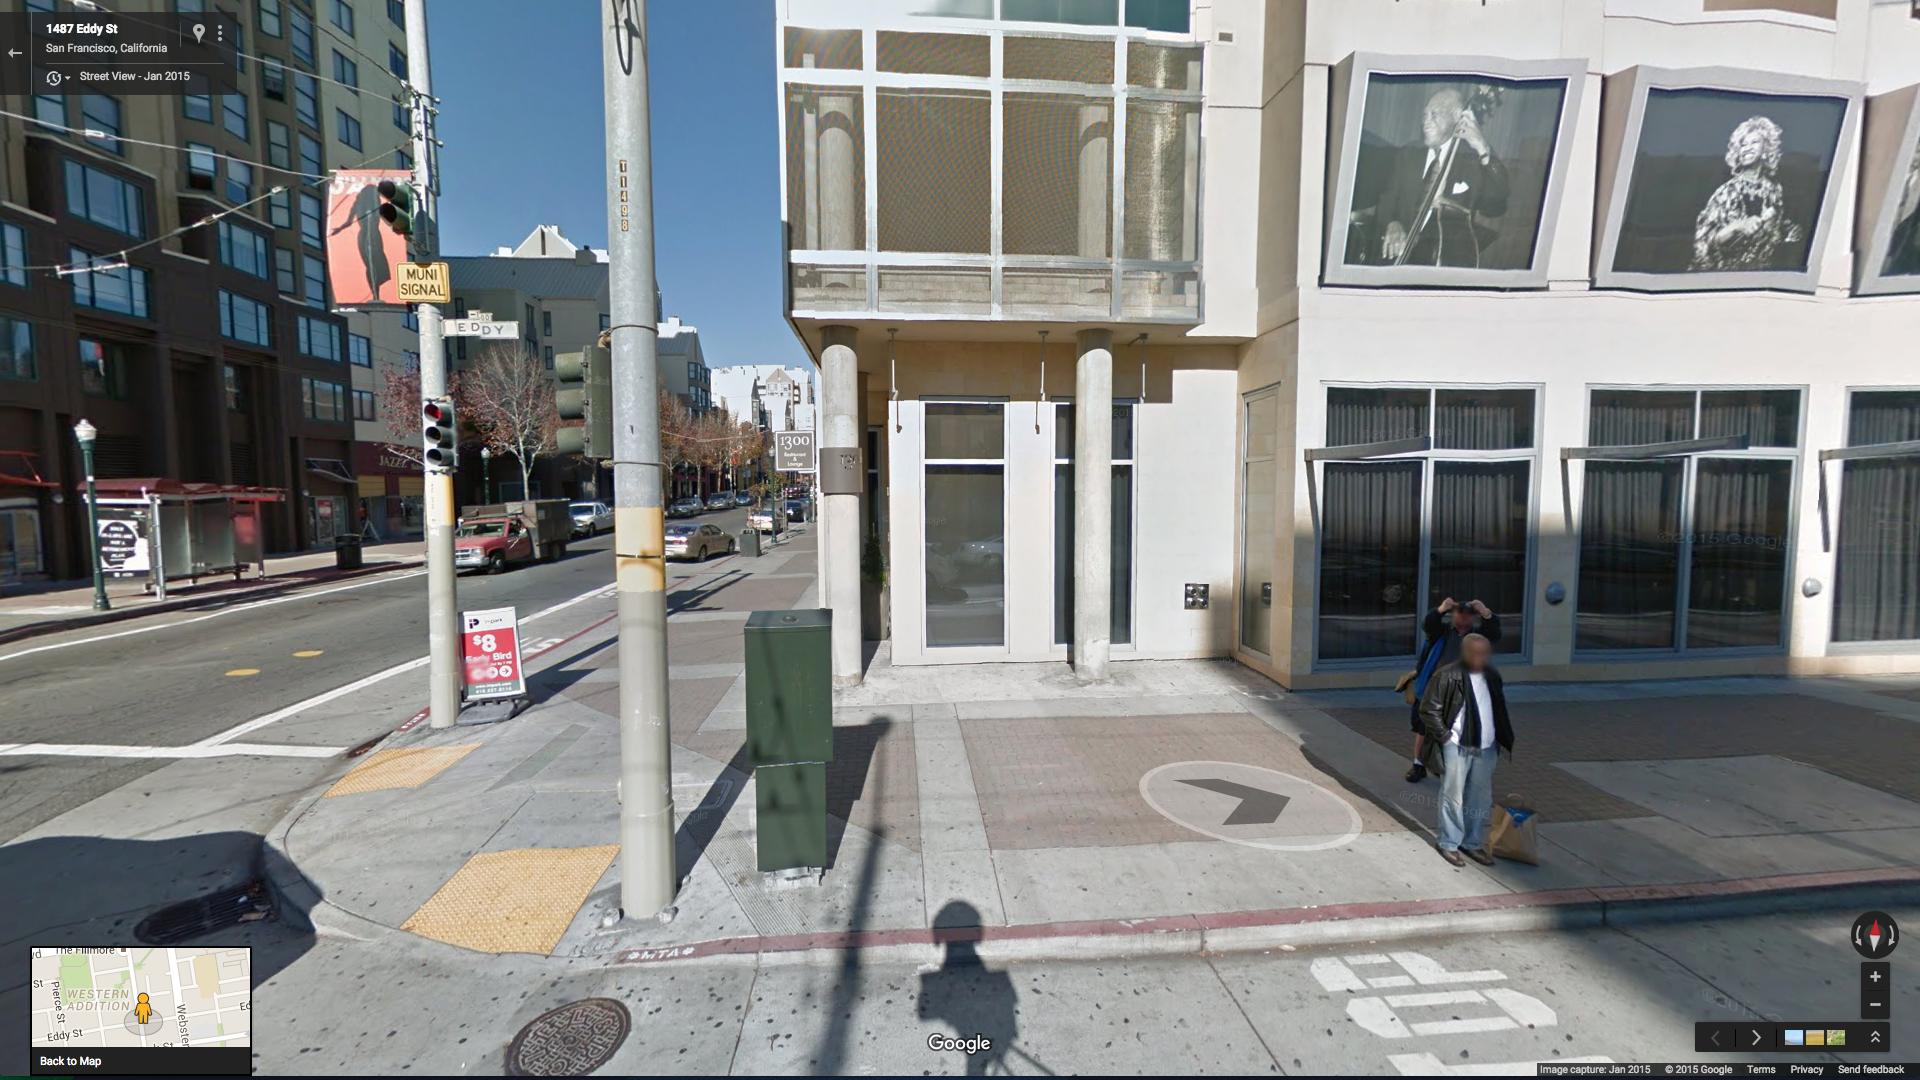 Matteo Bittanti,  The Google Street View Salute Series #5 , 2015